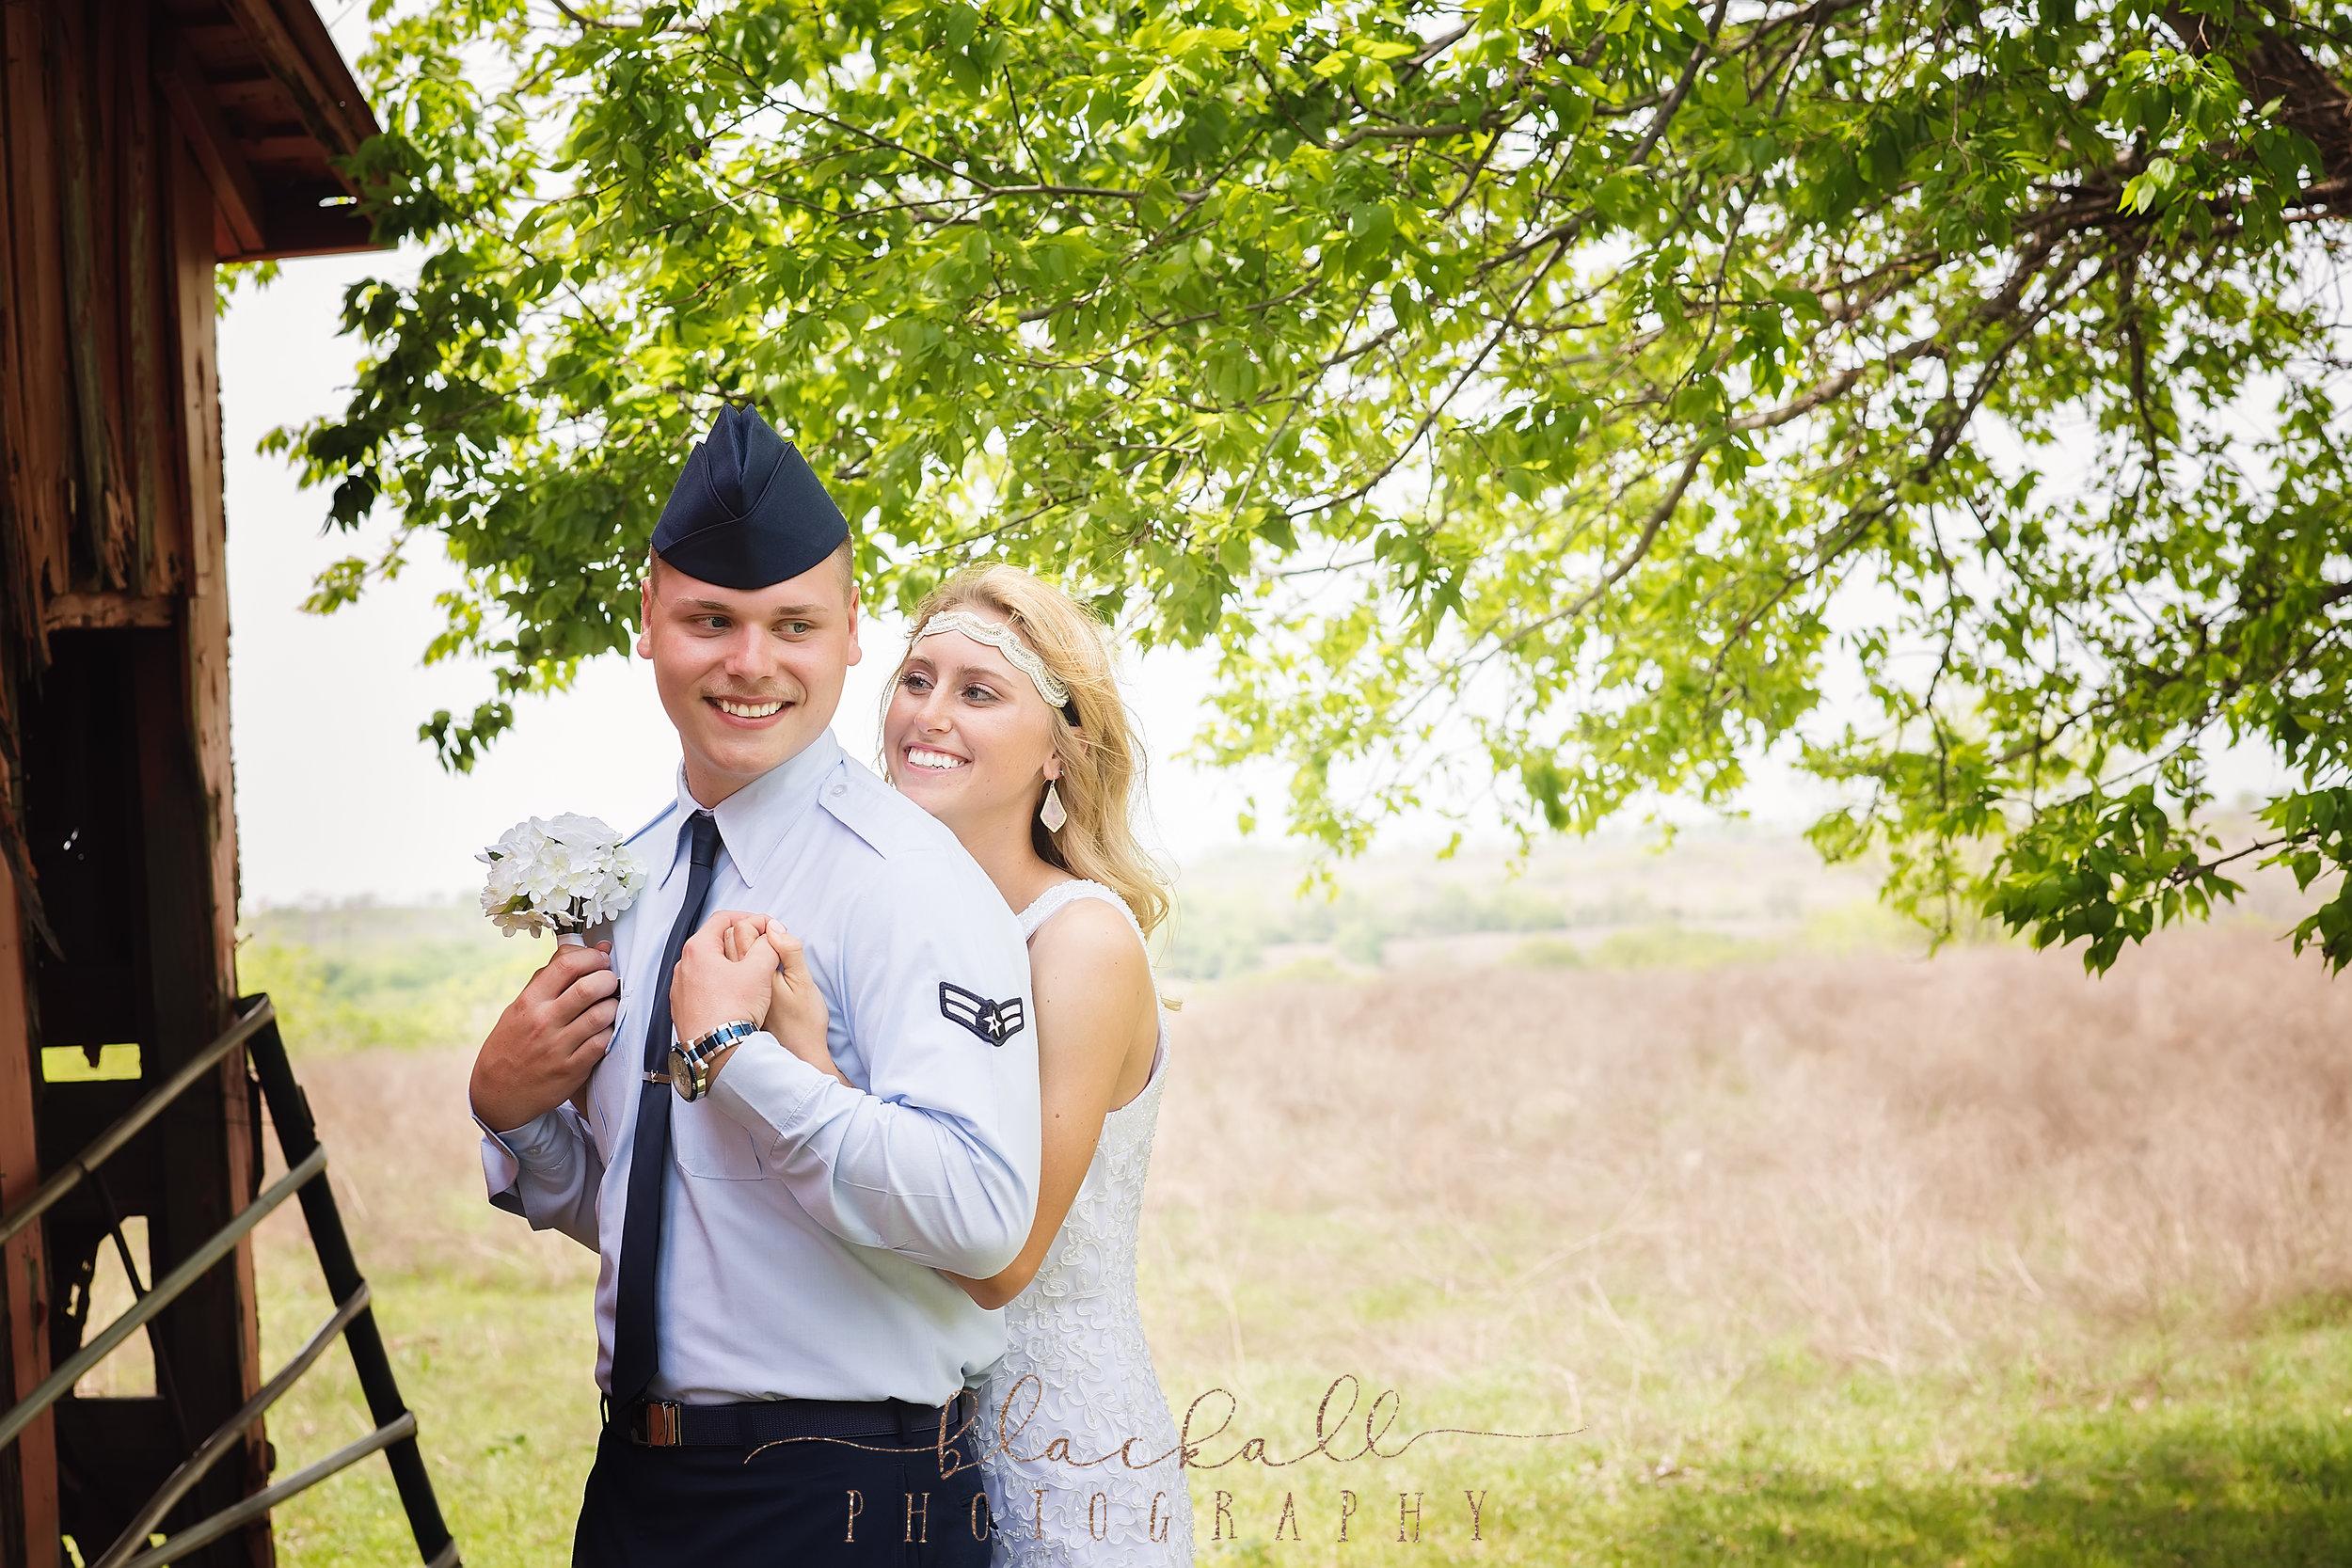 Taylor Brooke Blackall Photography North Texas Wedding Photographer Old Town Lewisville Texas Blackall Photography Llc